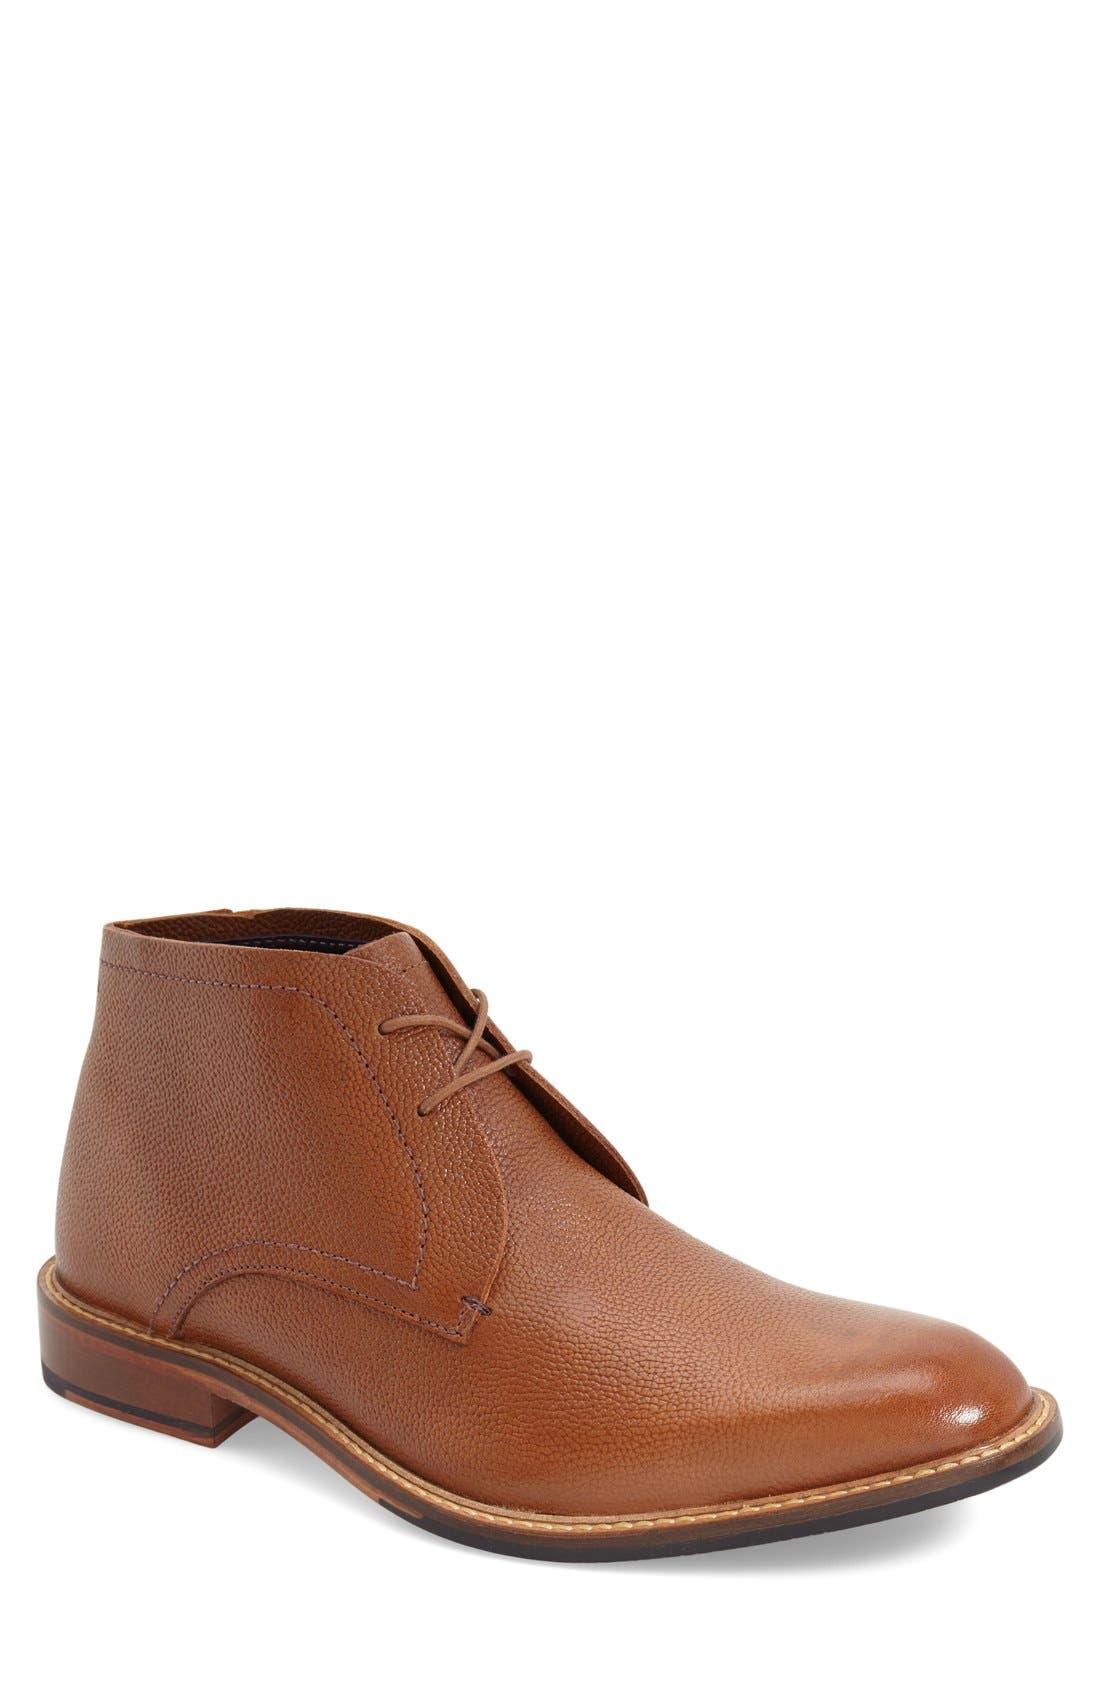 Alternate Image 1 Selected - Ted Baker London 'Torsdi 4' Chukka Boot (Men)